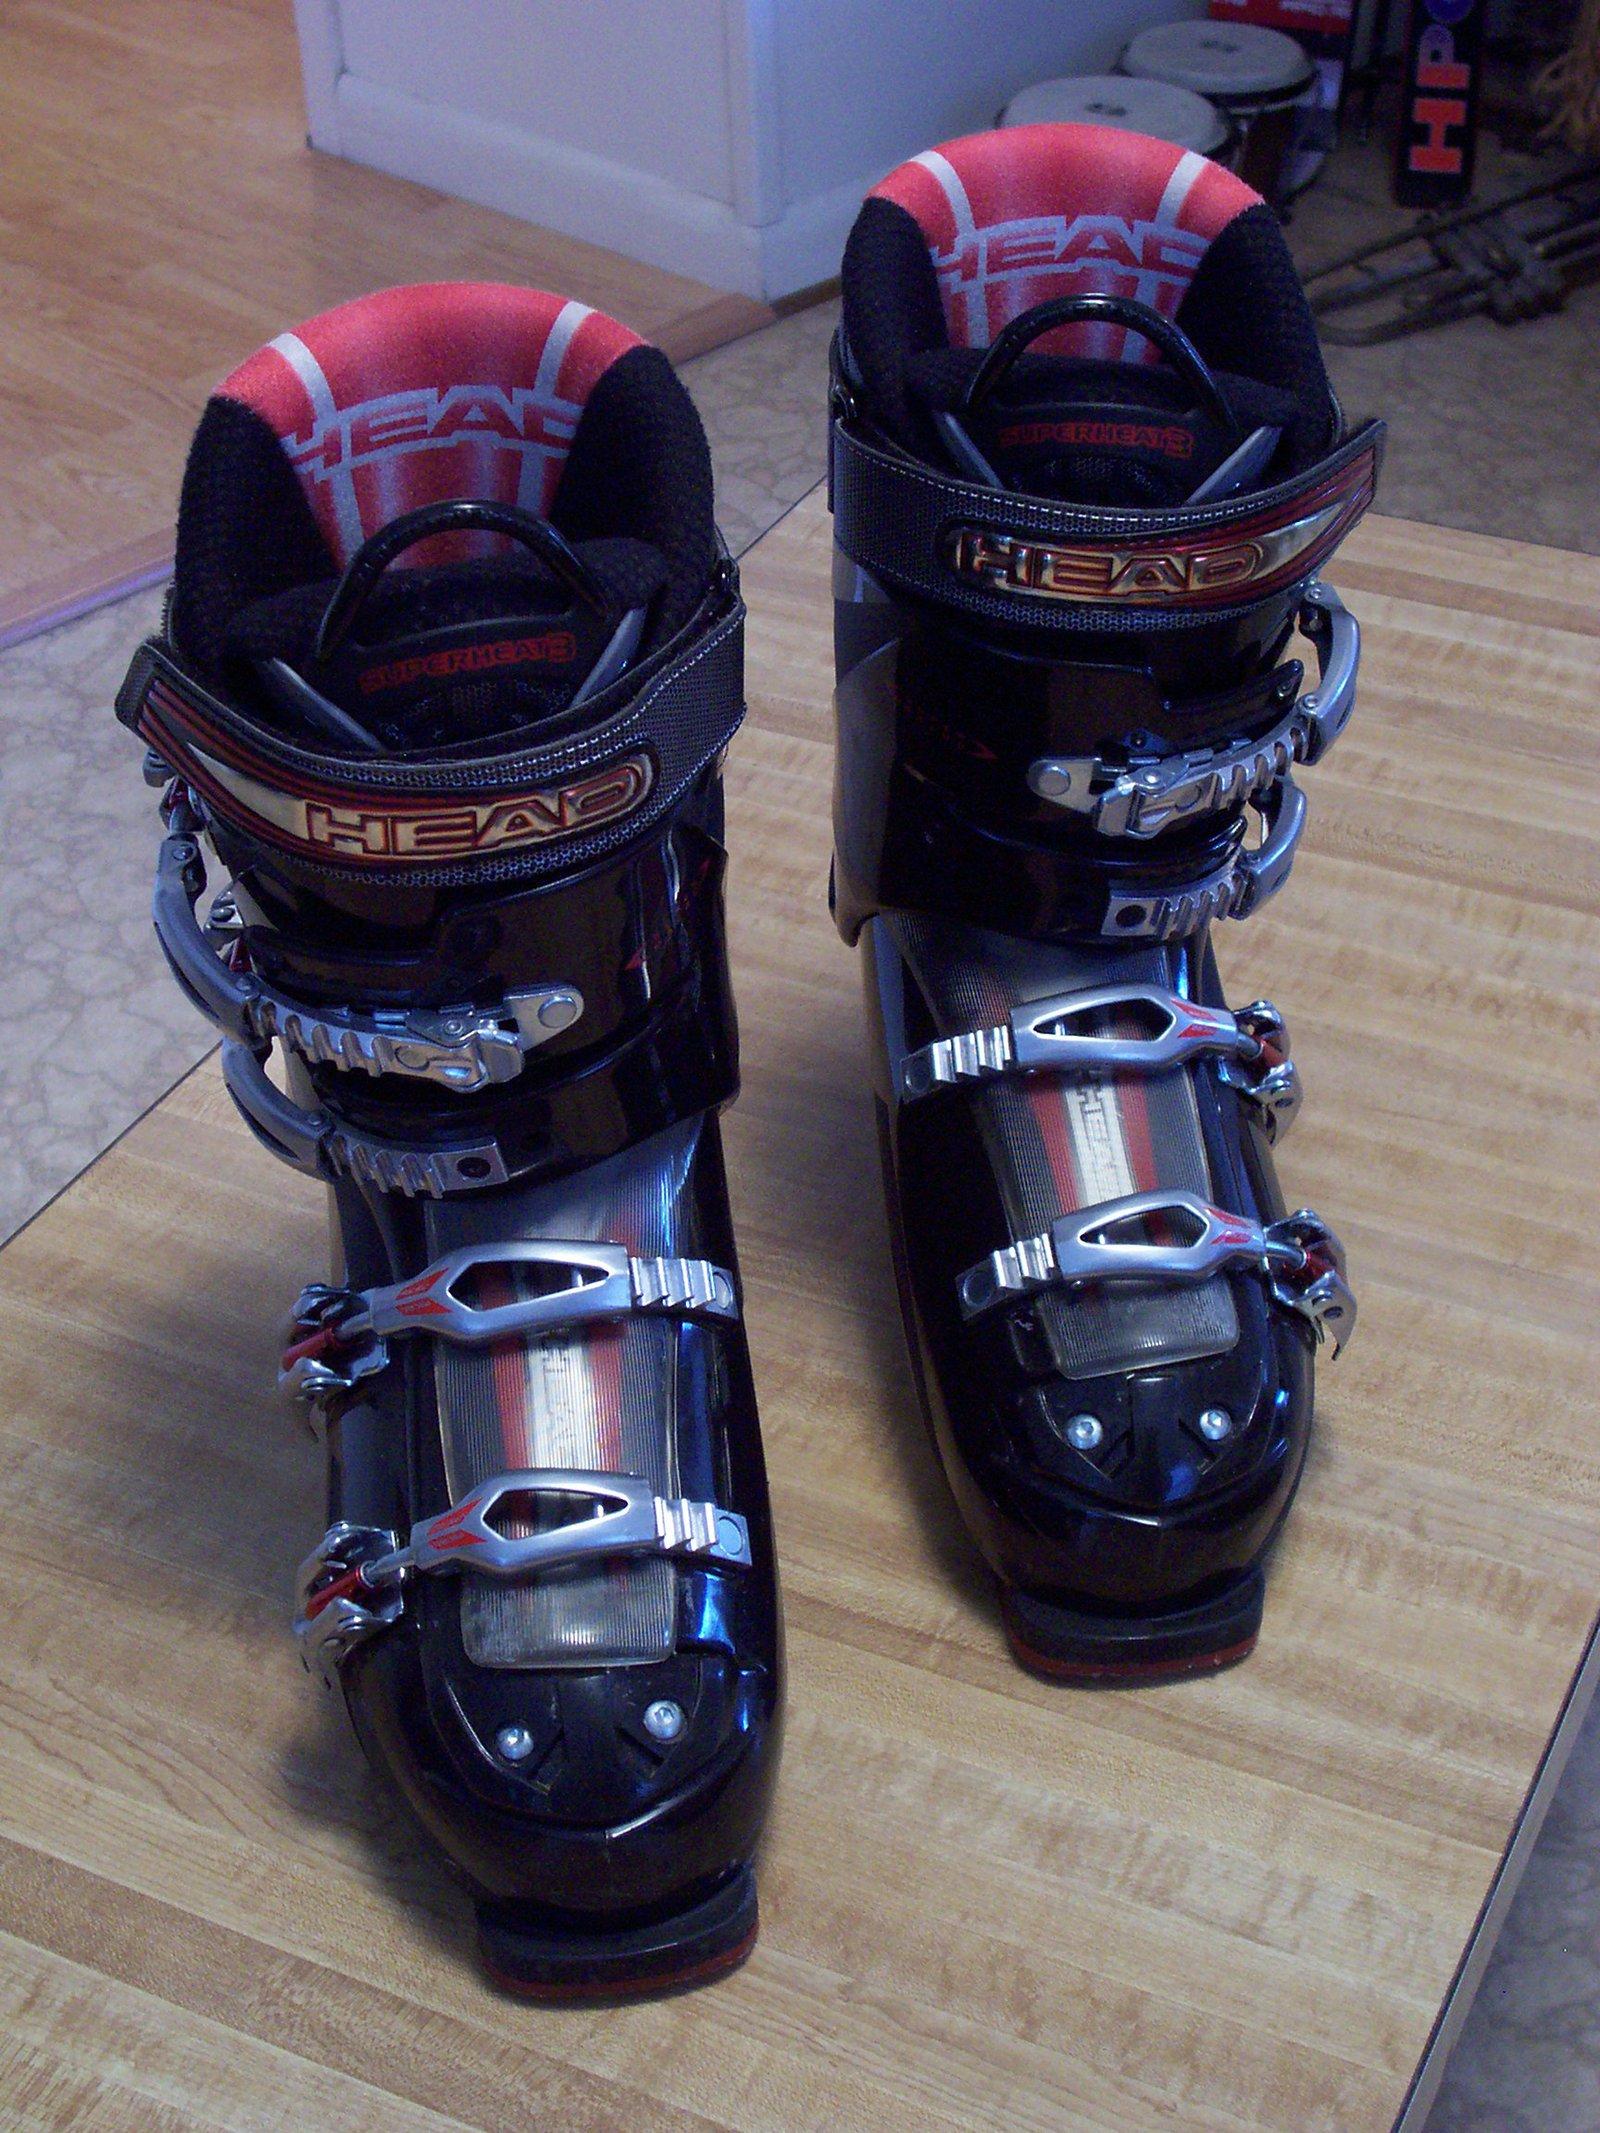 Head ski boots